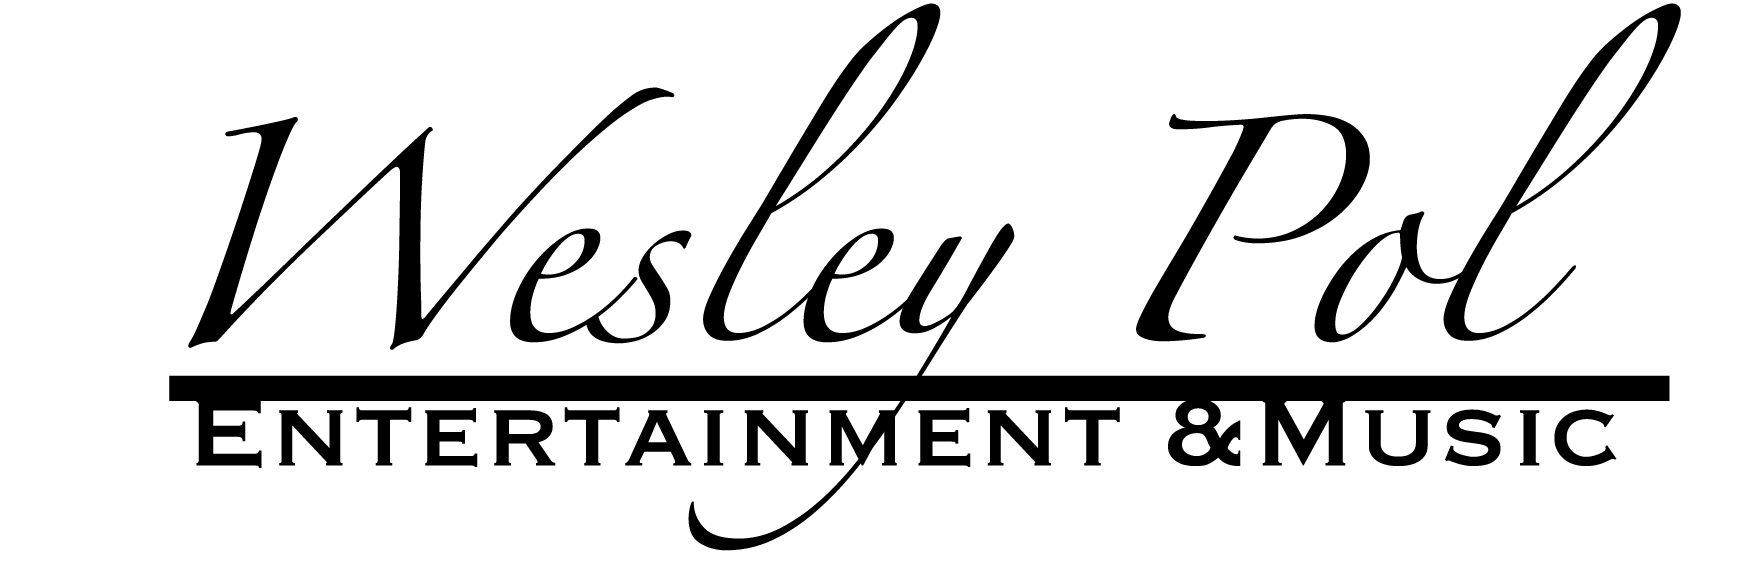 Wesley Pol